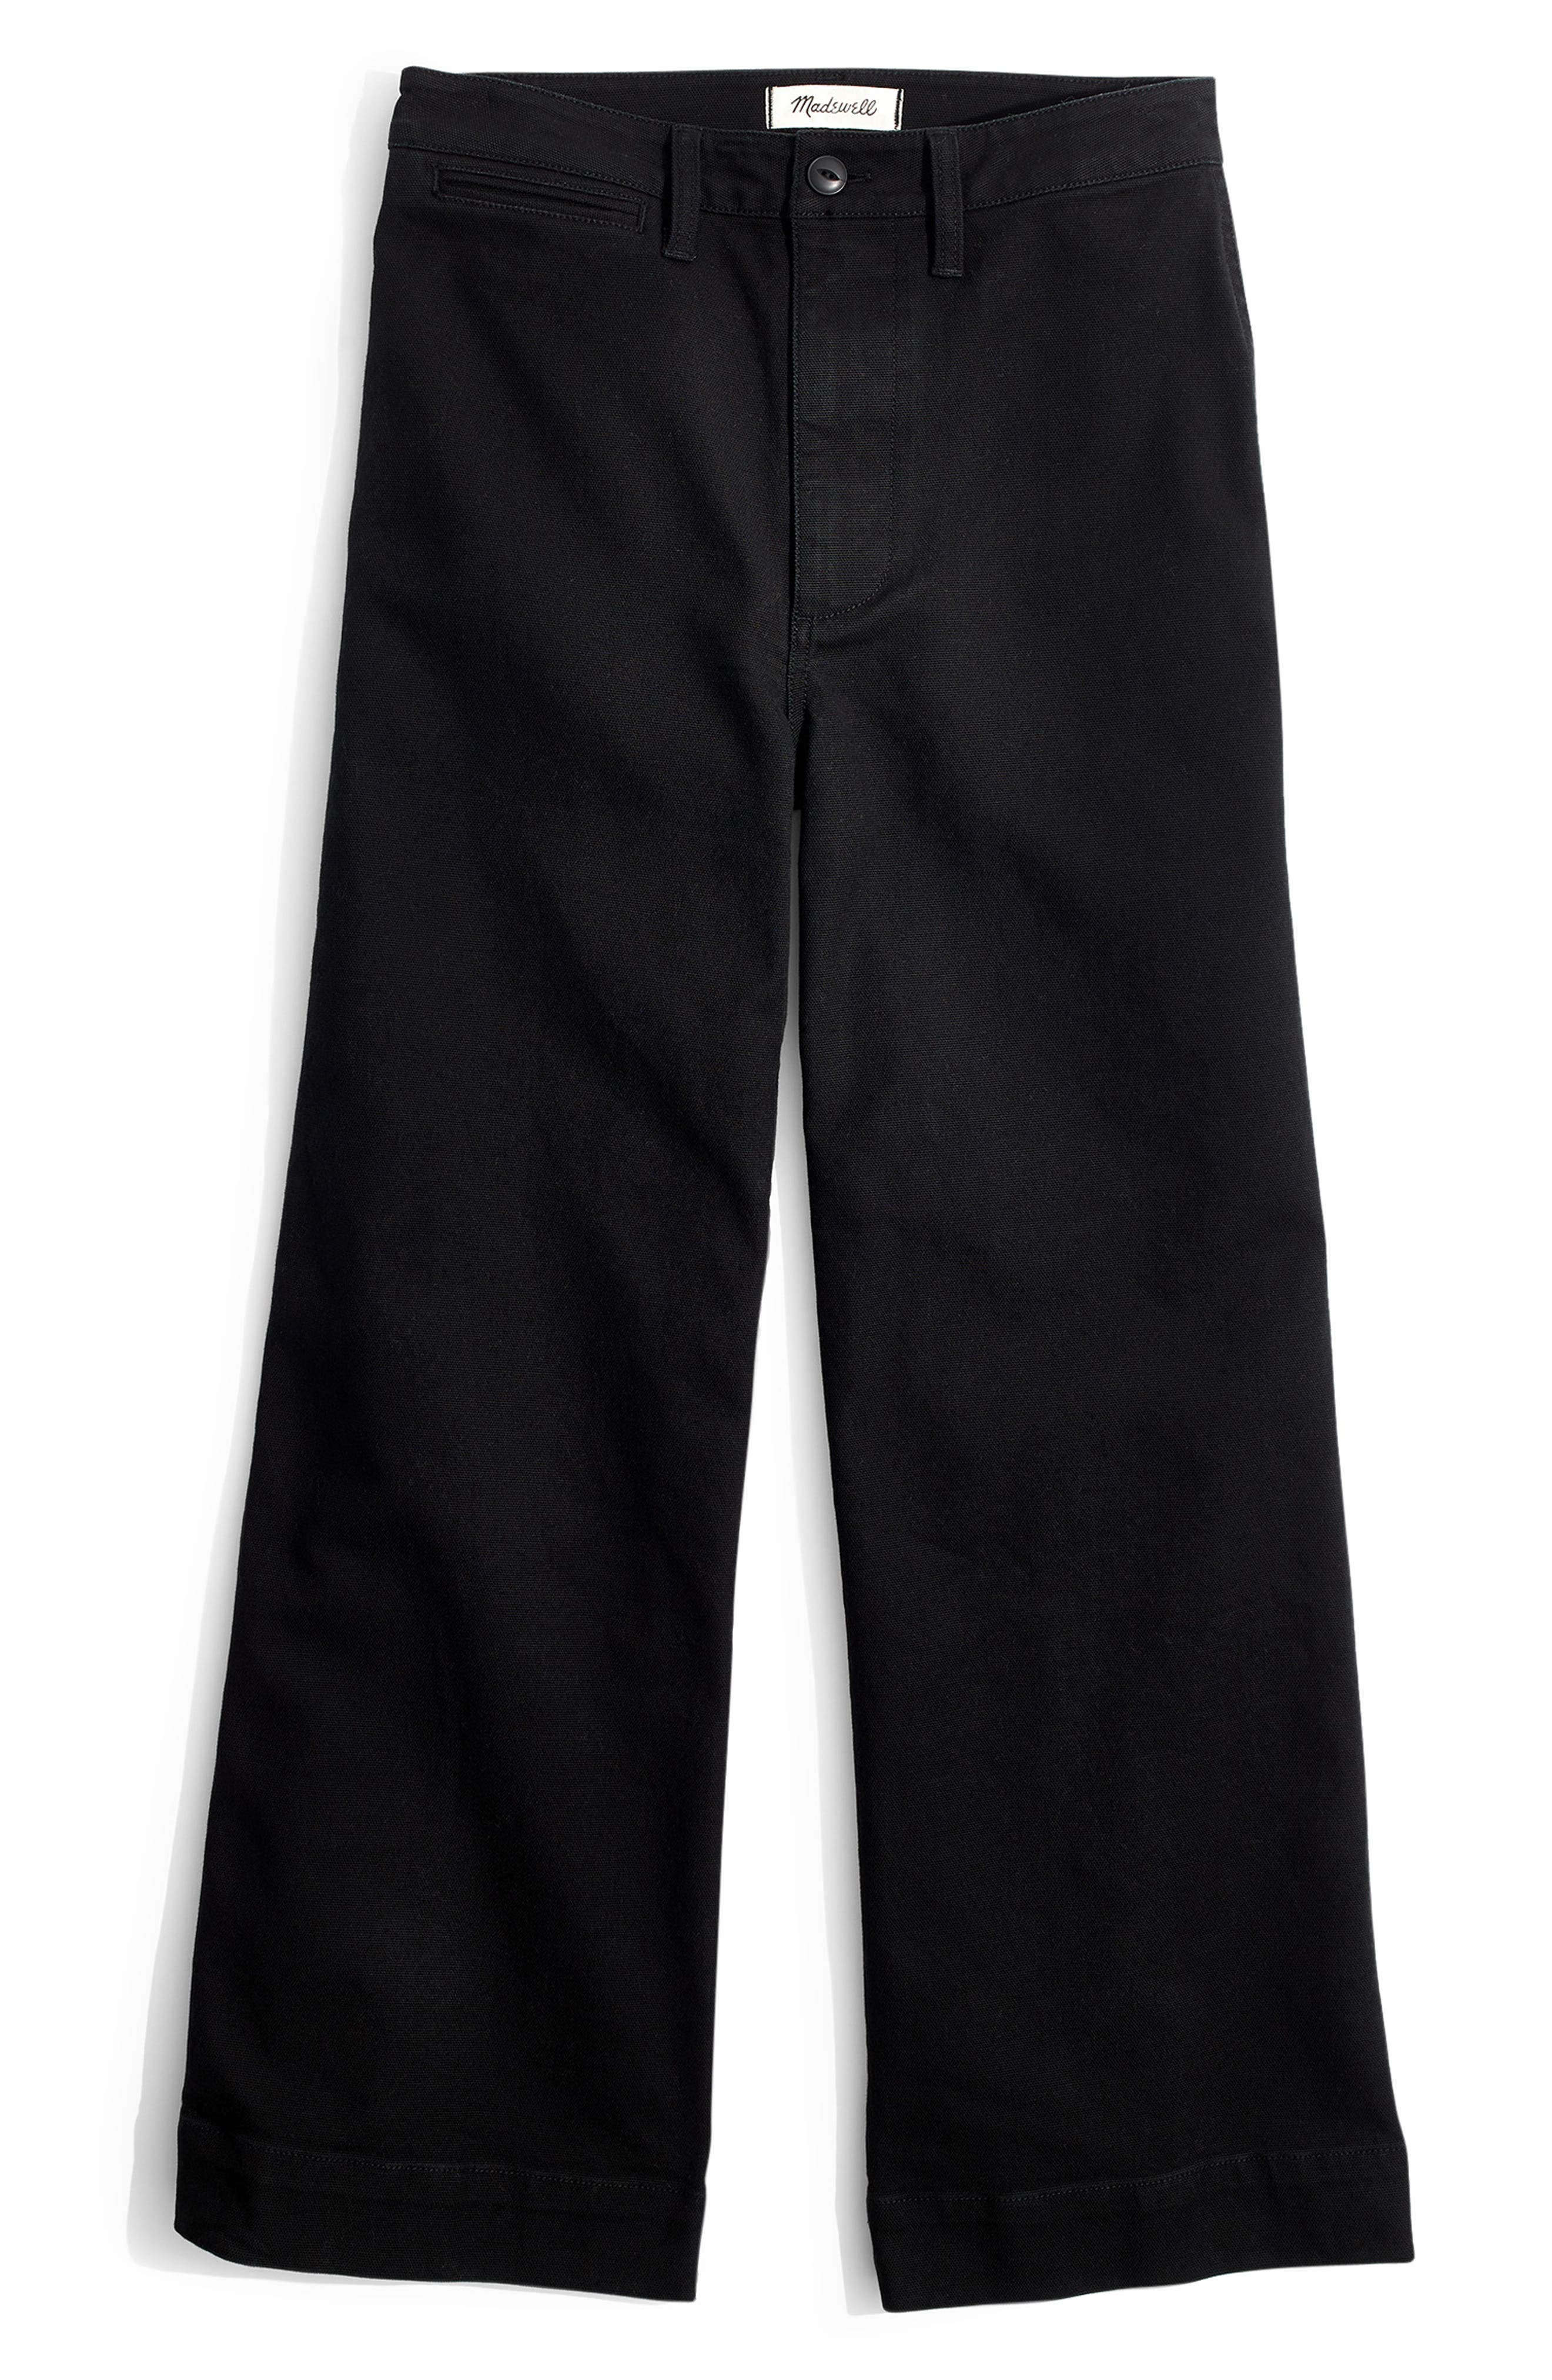 MADEWELL, Emmett Crop Wide Leg Pants, Alternate thumbnail 6, color, CLASSIC BLACK